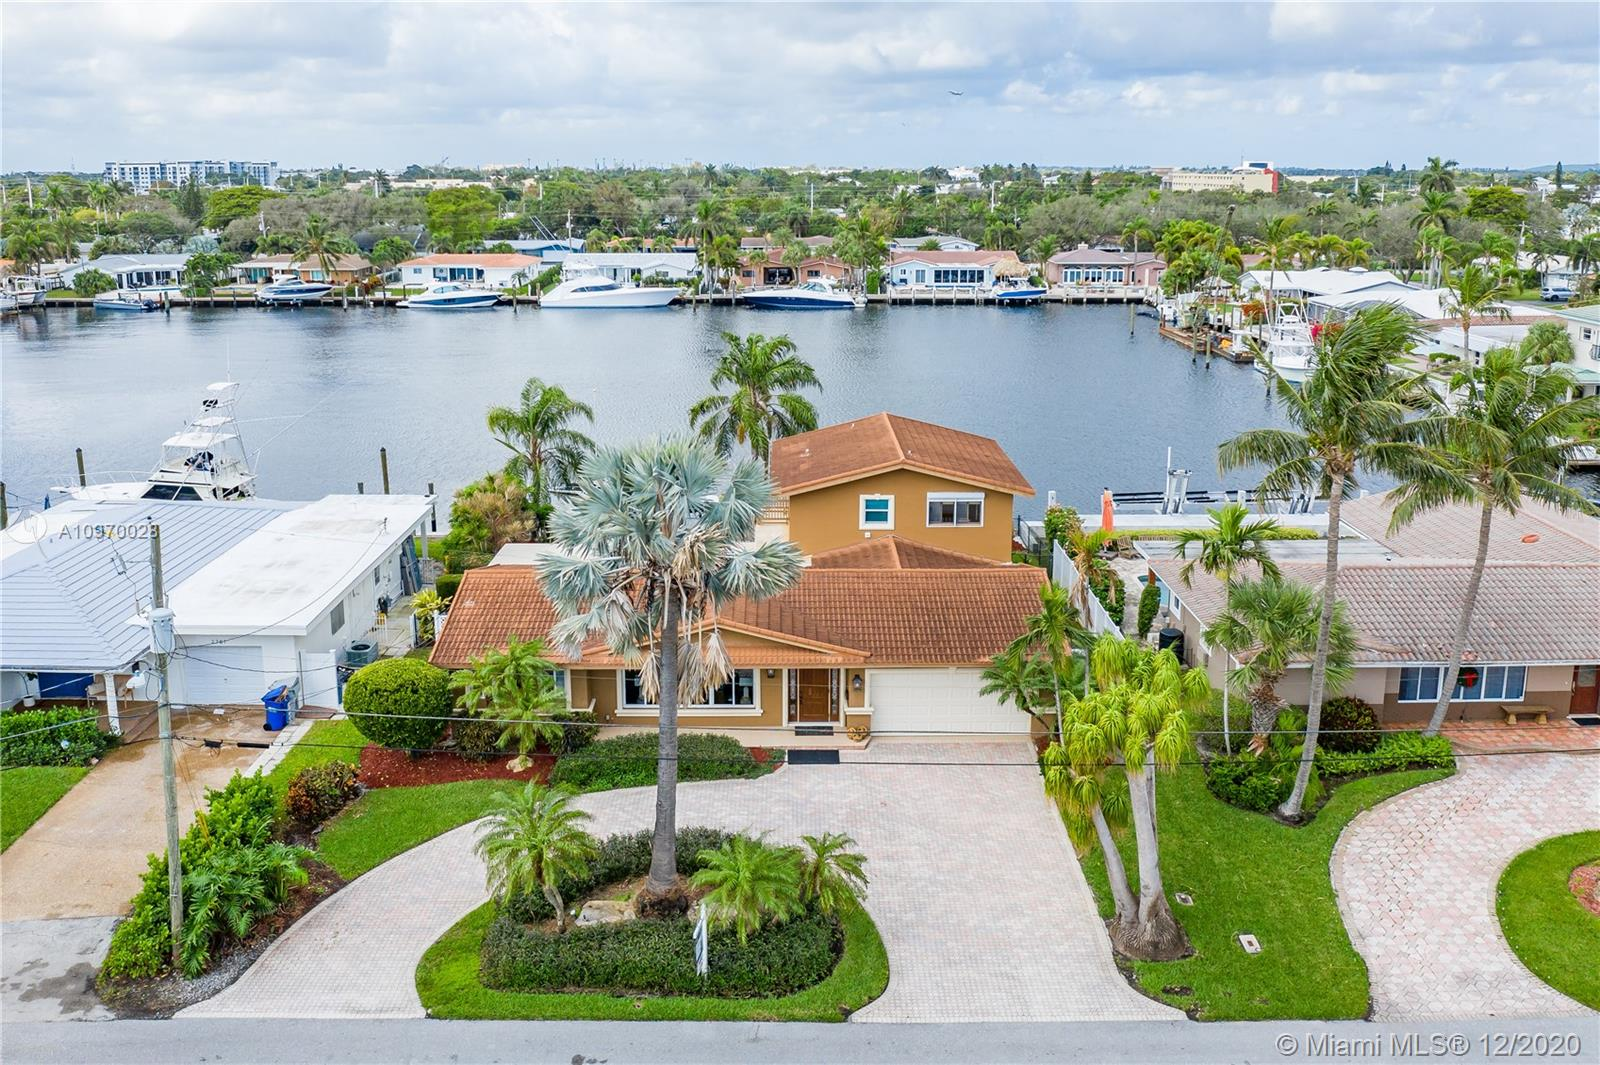 Harbor Village, 2771 NE 9th St, Pompano Beach, Florida 33062